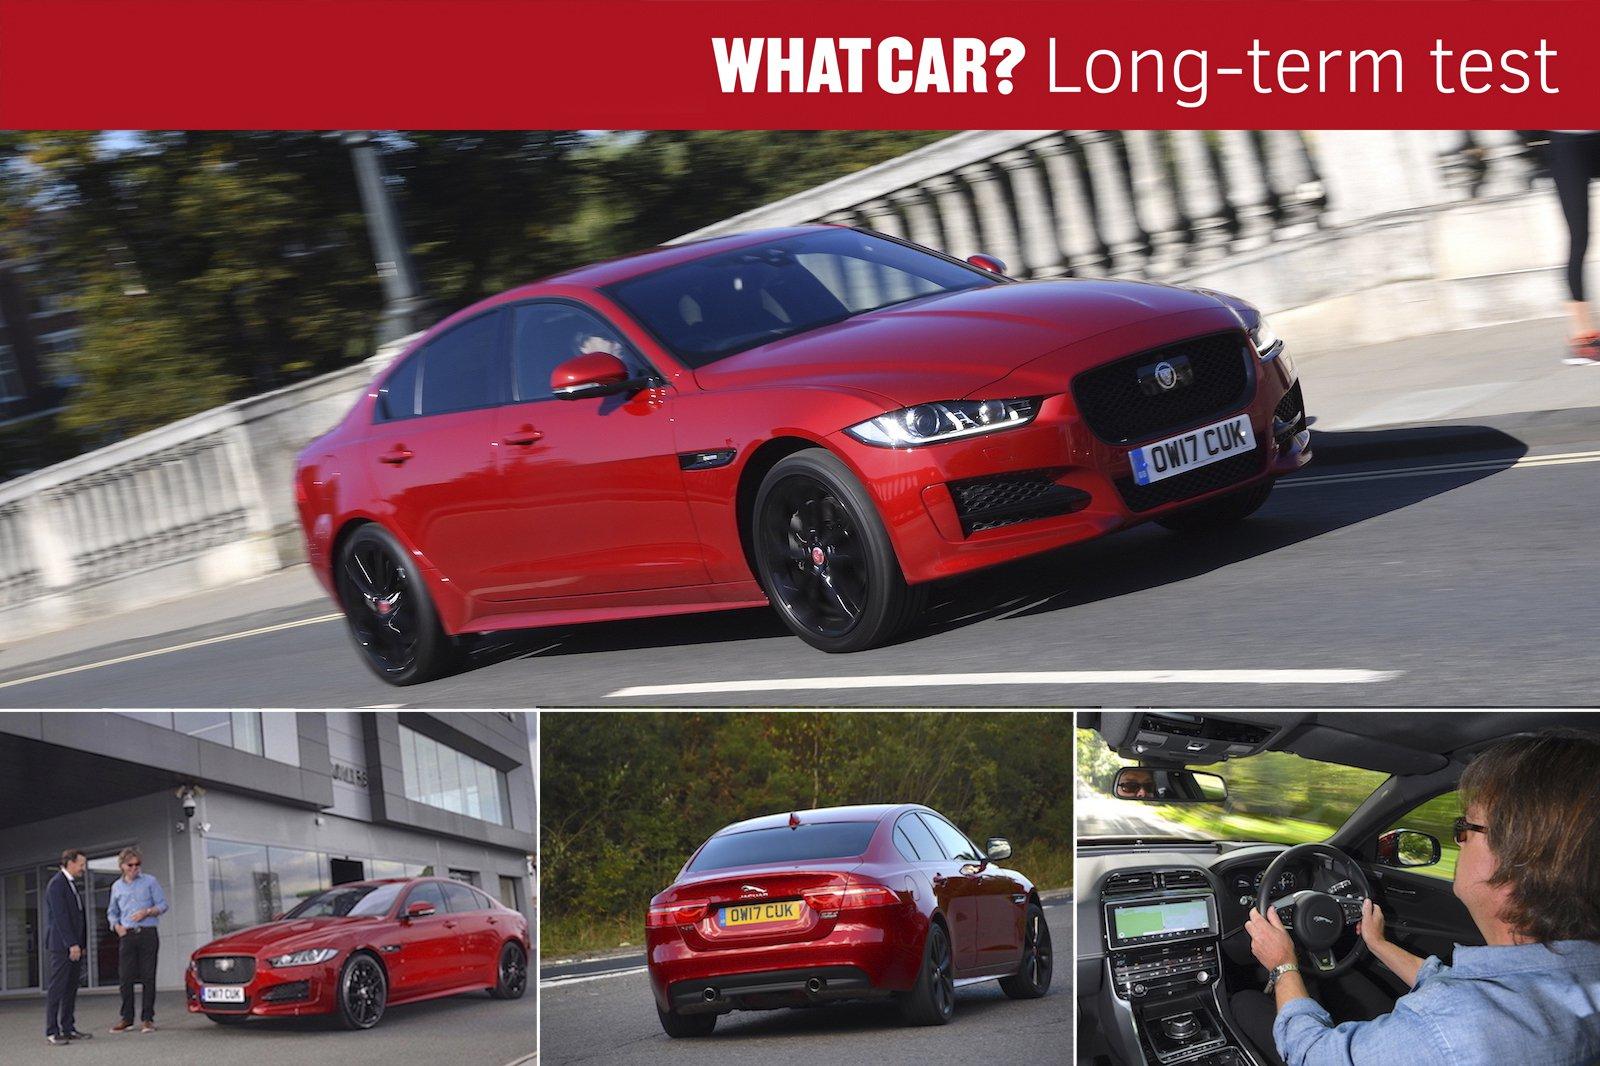 Used Jaguar XE long-term test